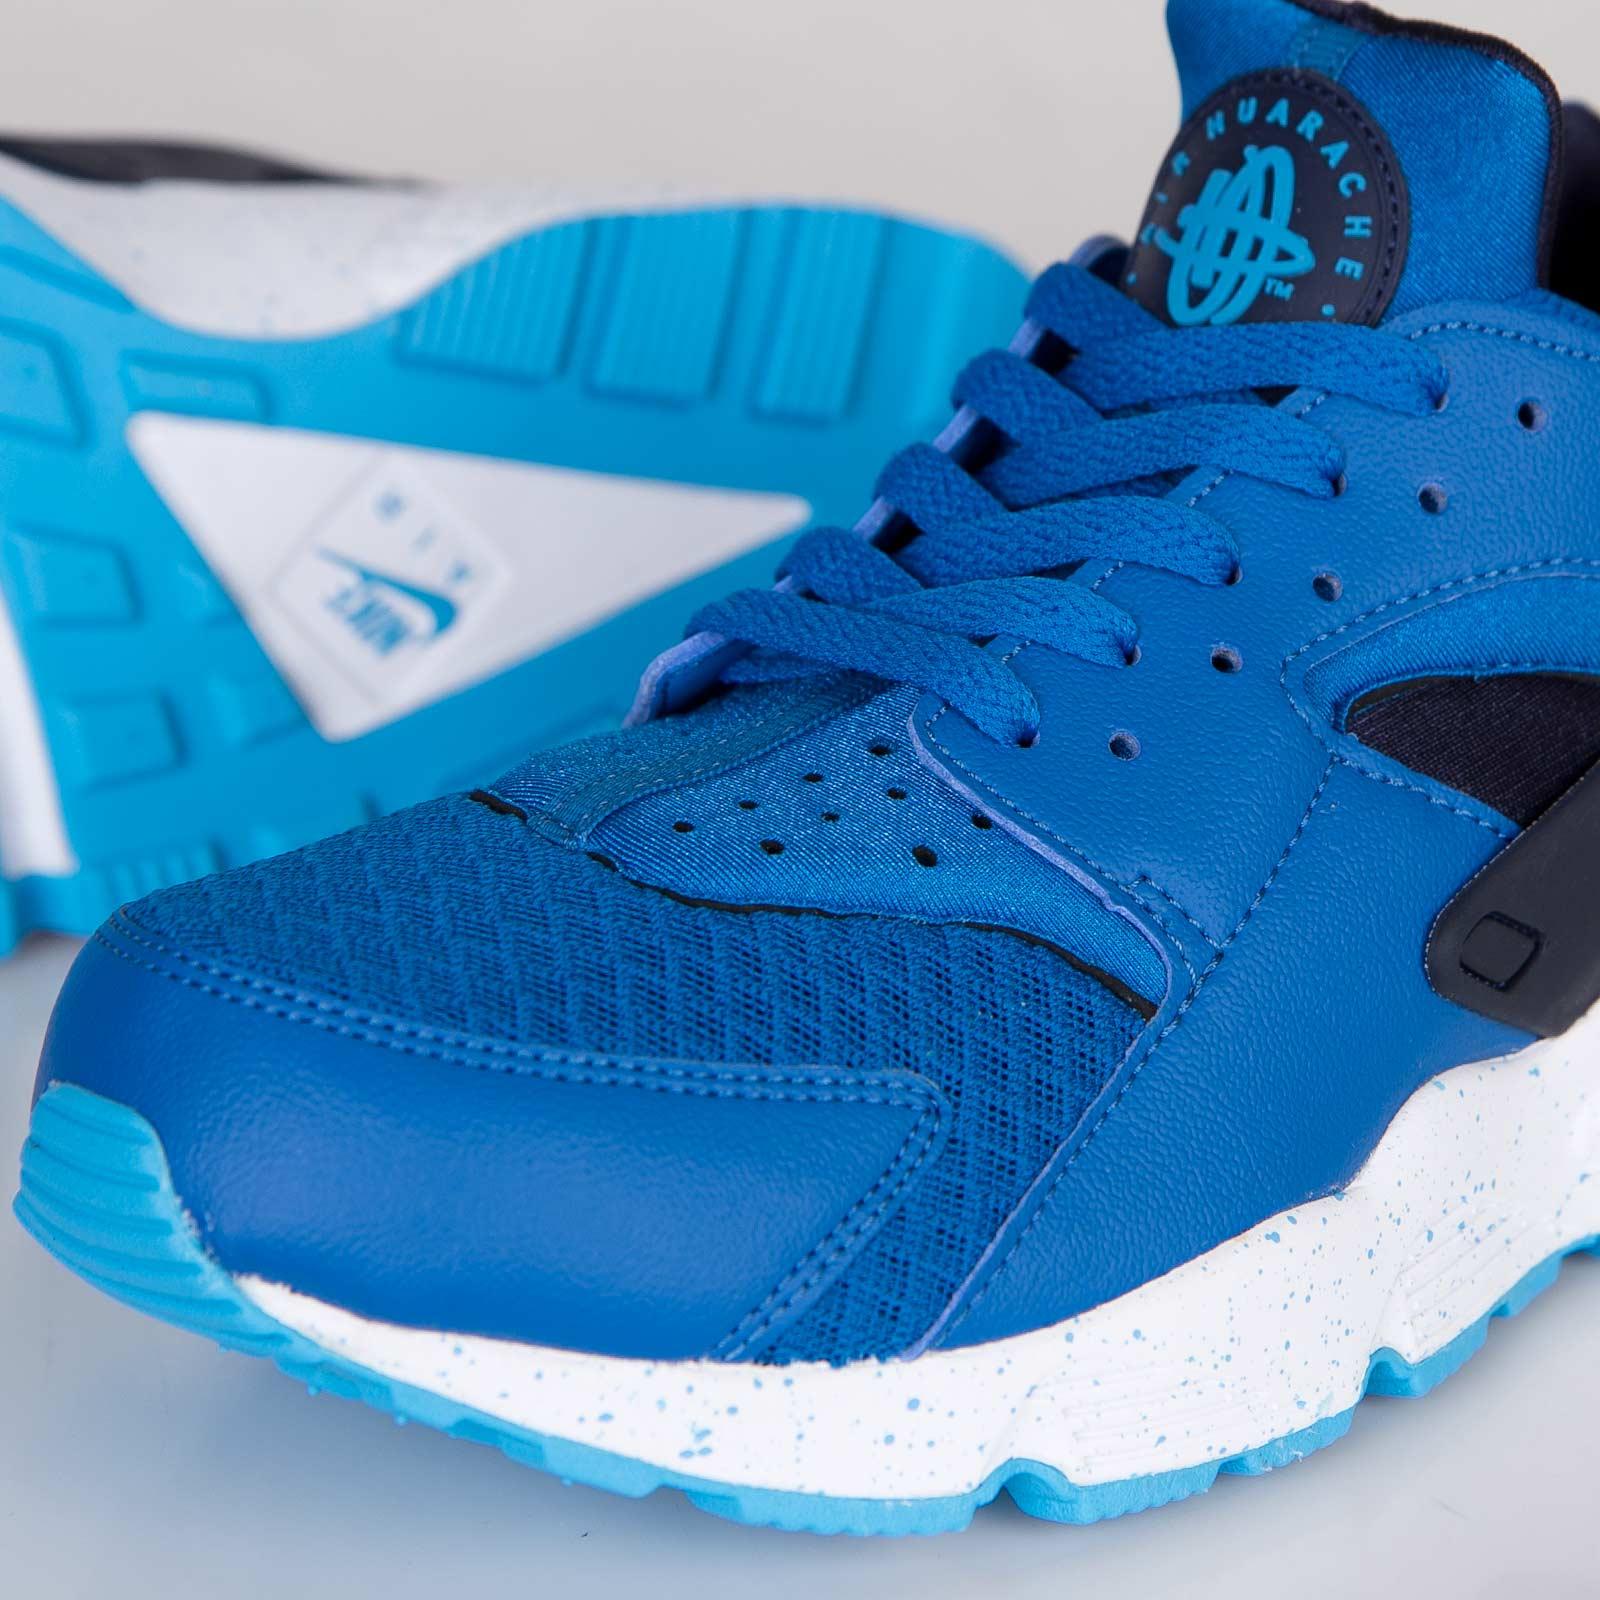 timeless design 39162 e1368 Nike Air Huarache - 318429-441 - Sneakersnstuff   sneakers   streetwear  online since 1999